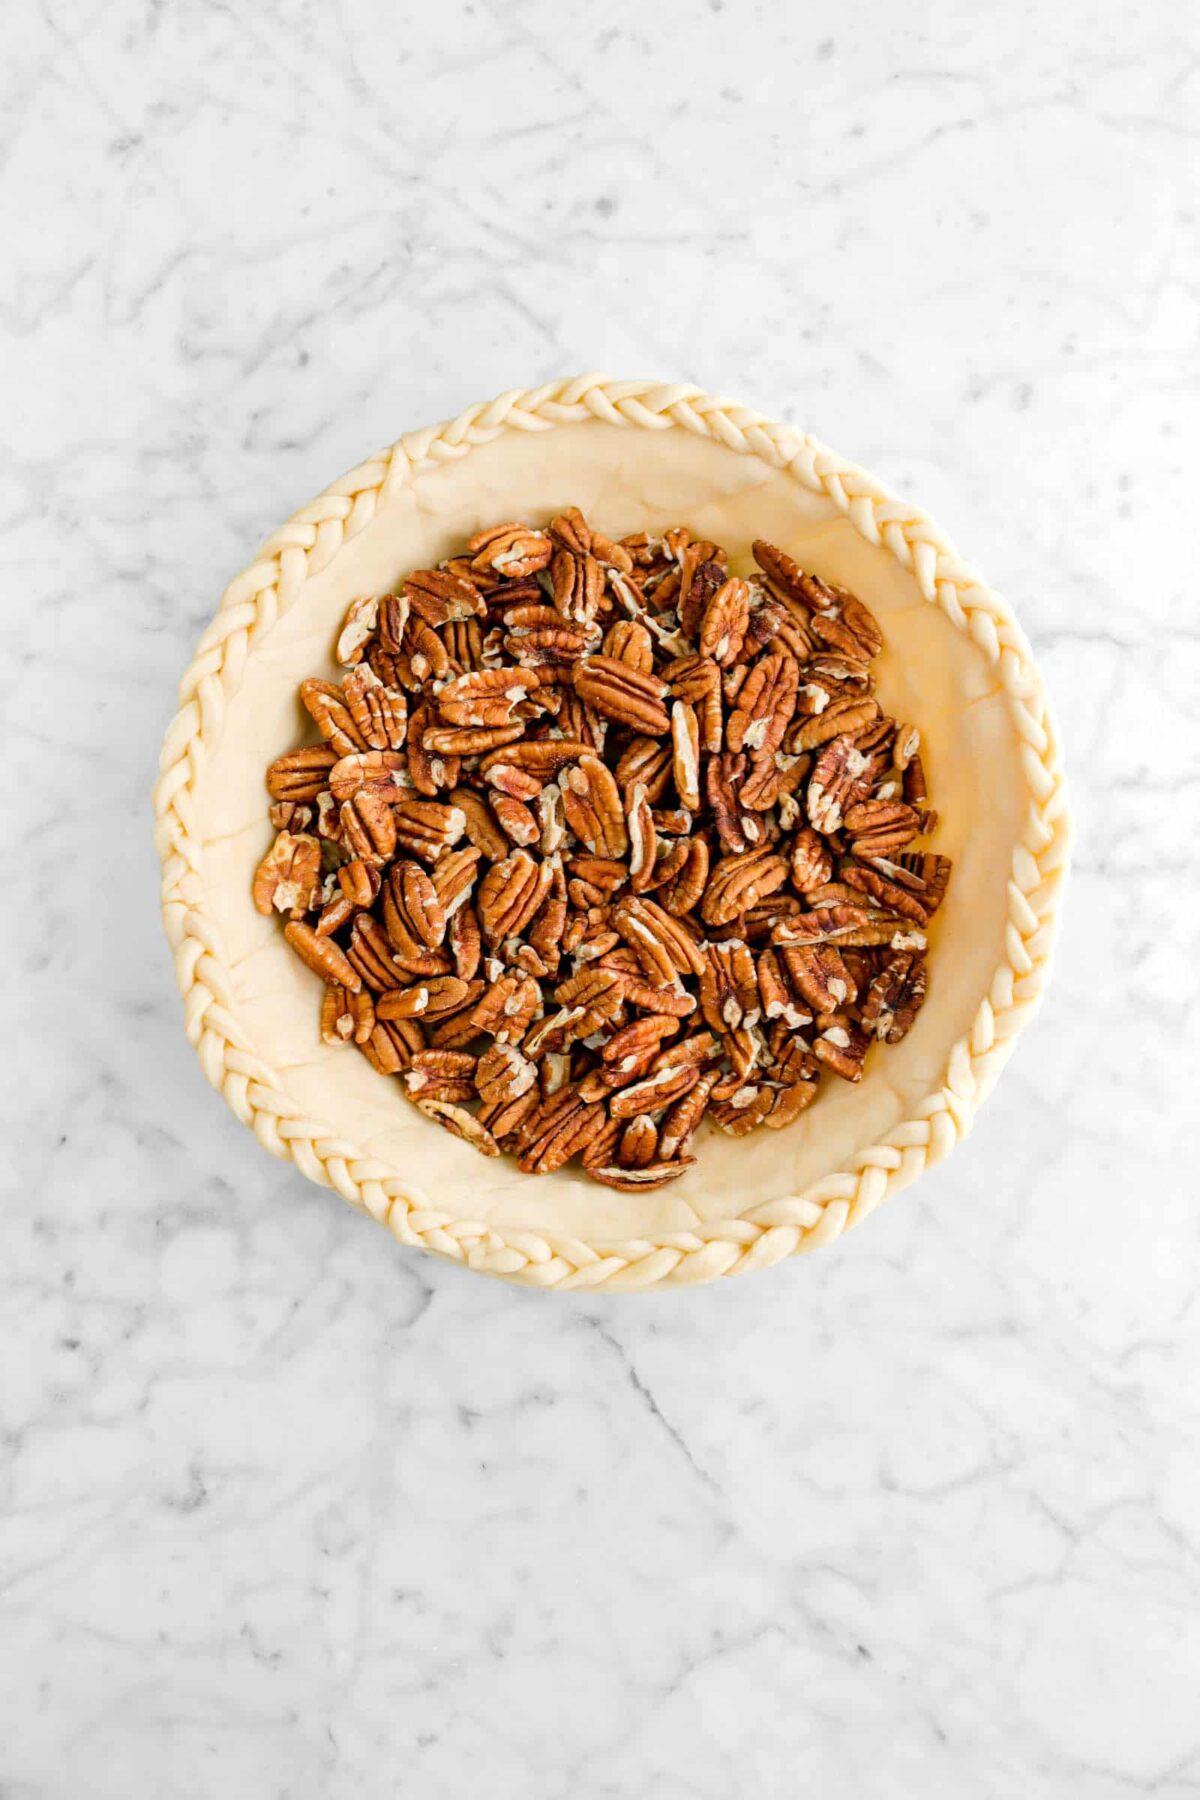 pecans in a unbaked pie crust